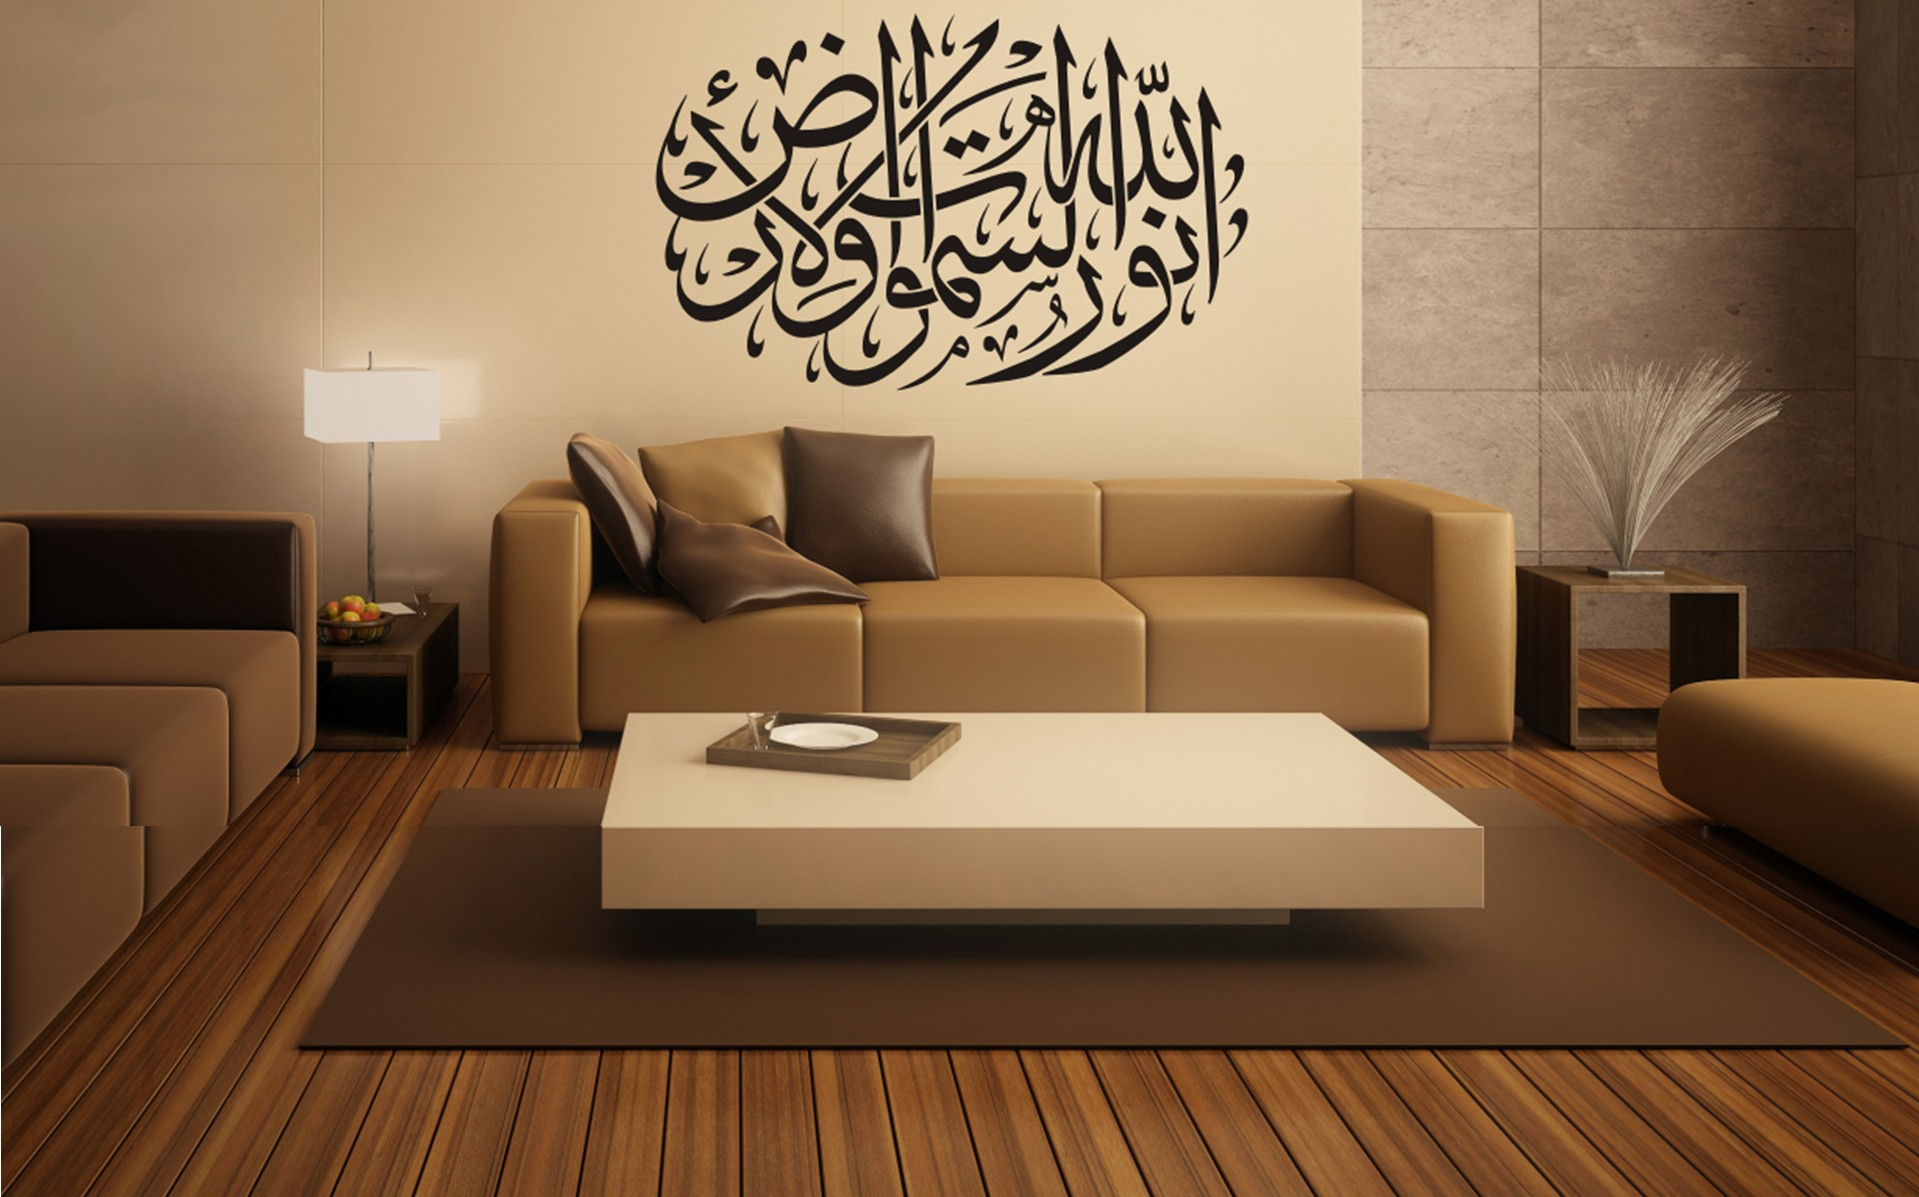 الديكور العربي فن و أصالة~~~بقلمي~~~ %D8%AF%D9%8A%D9%83%D